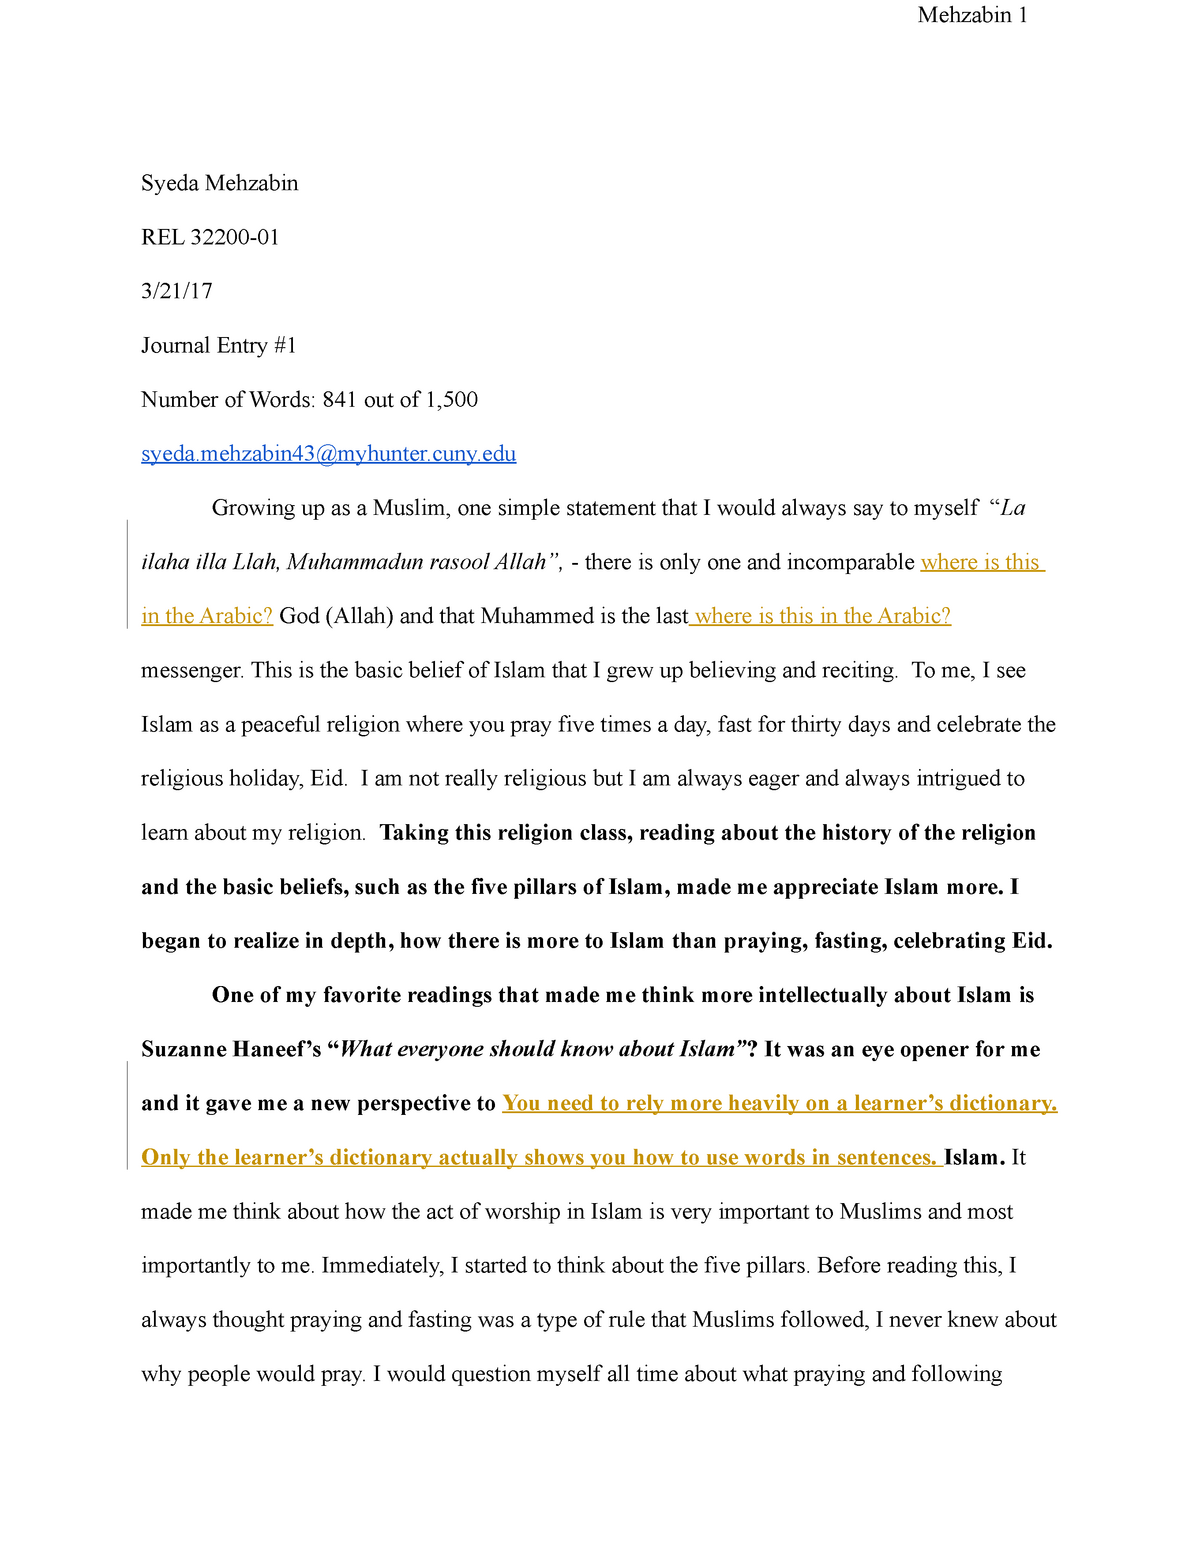 BFB-REL 322 Journal Entry - SOC 205: Religion - StuDocu